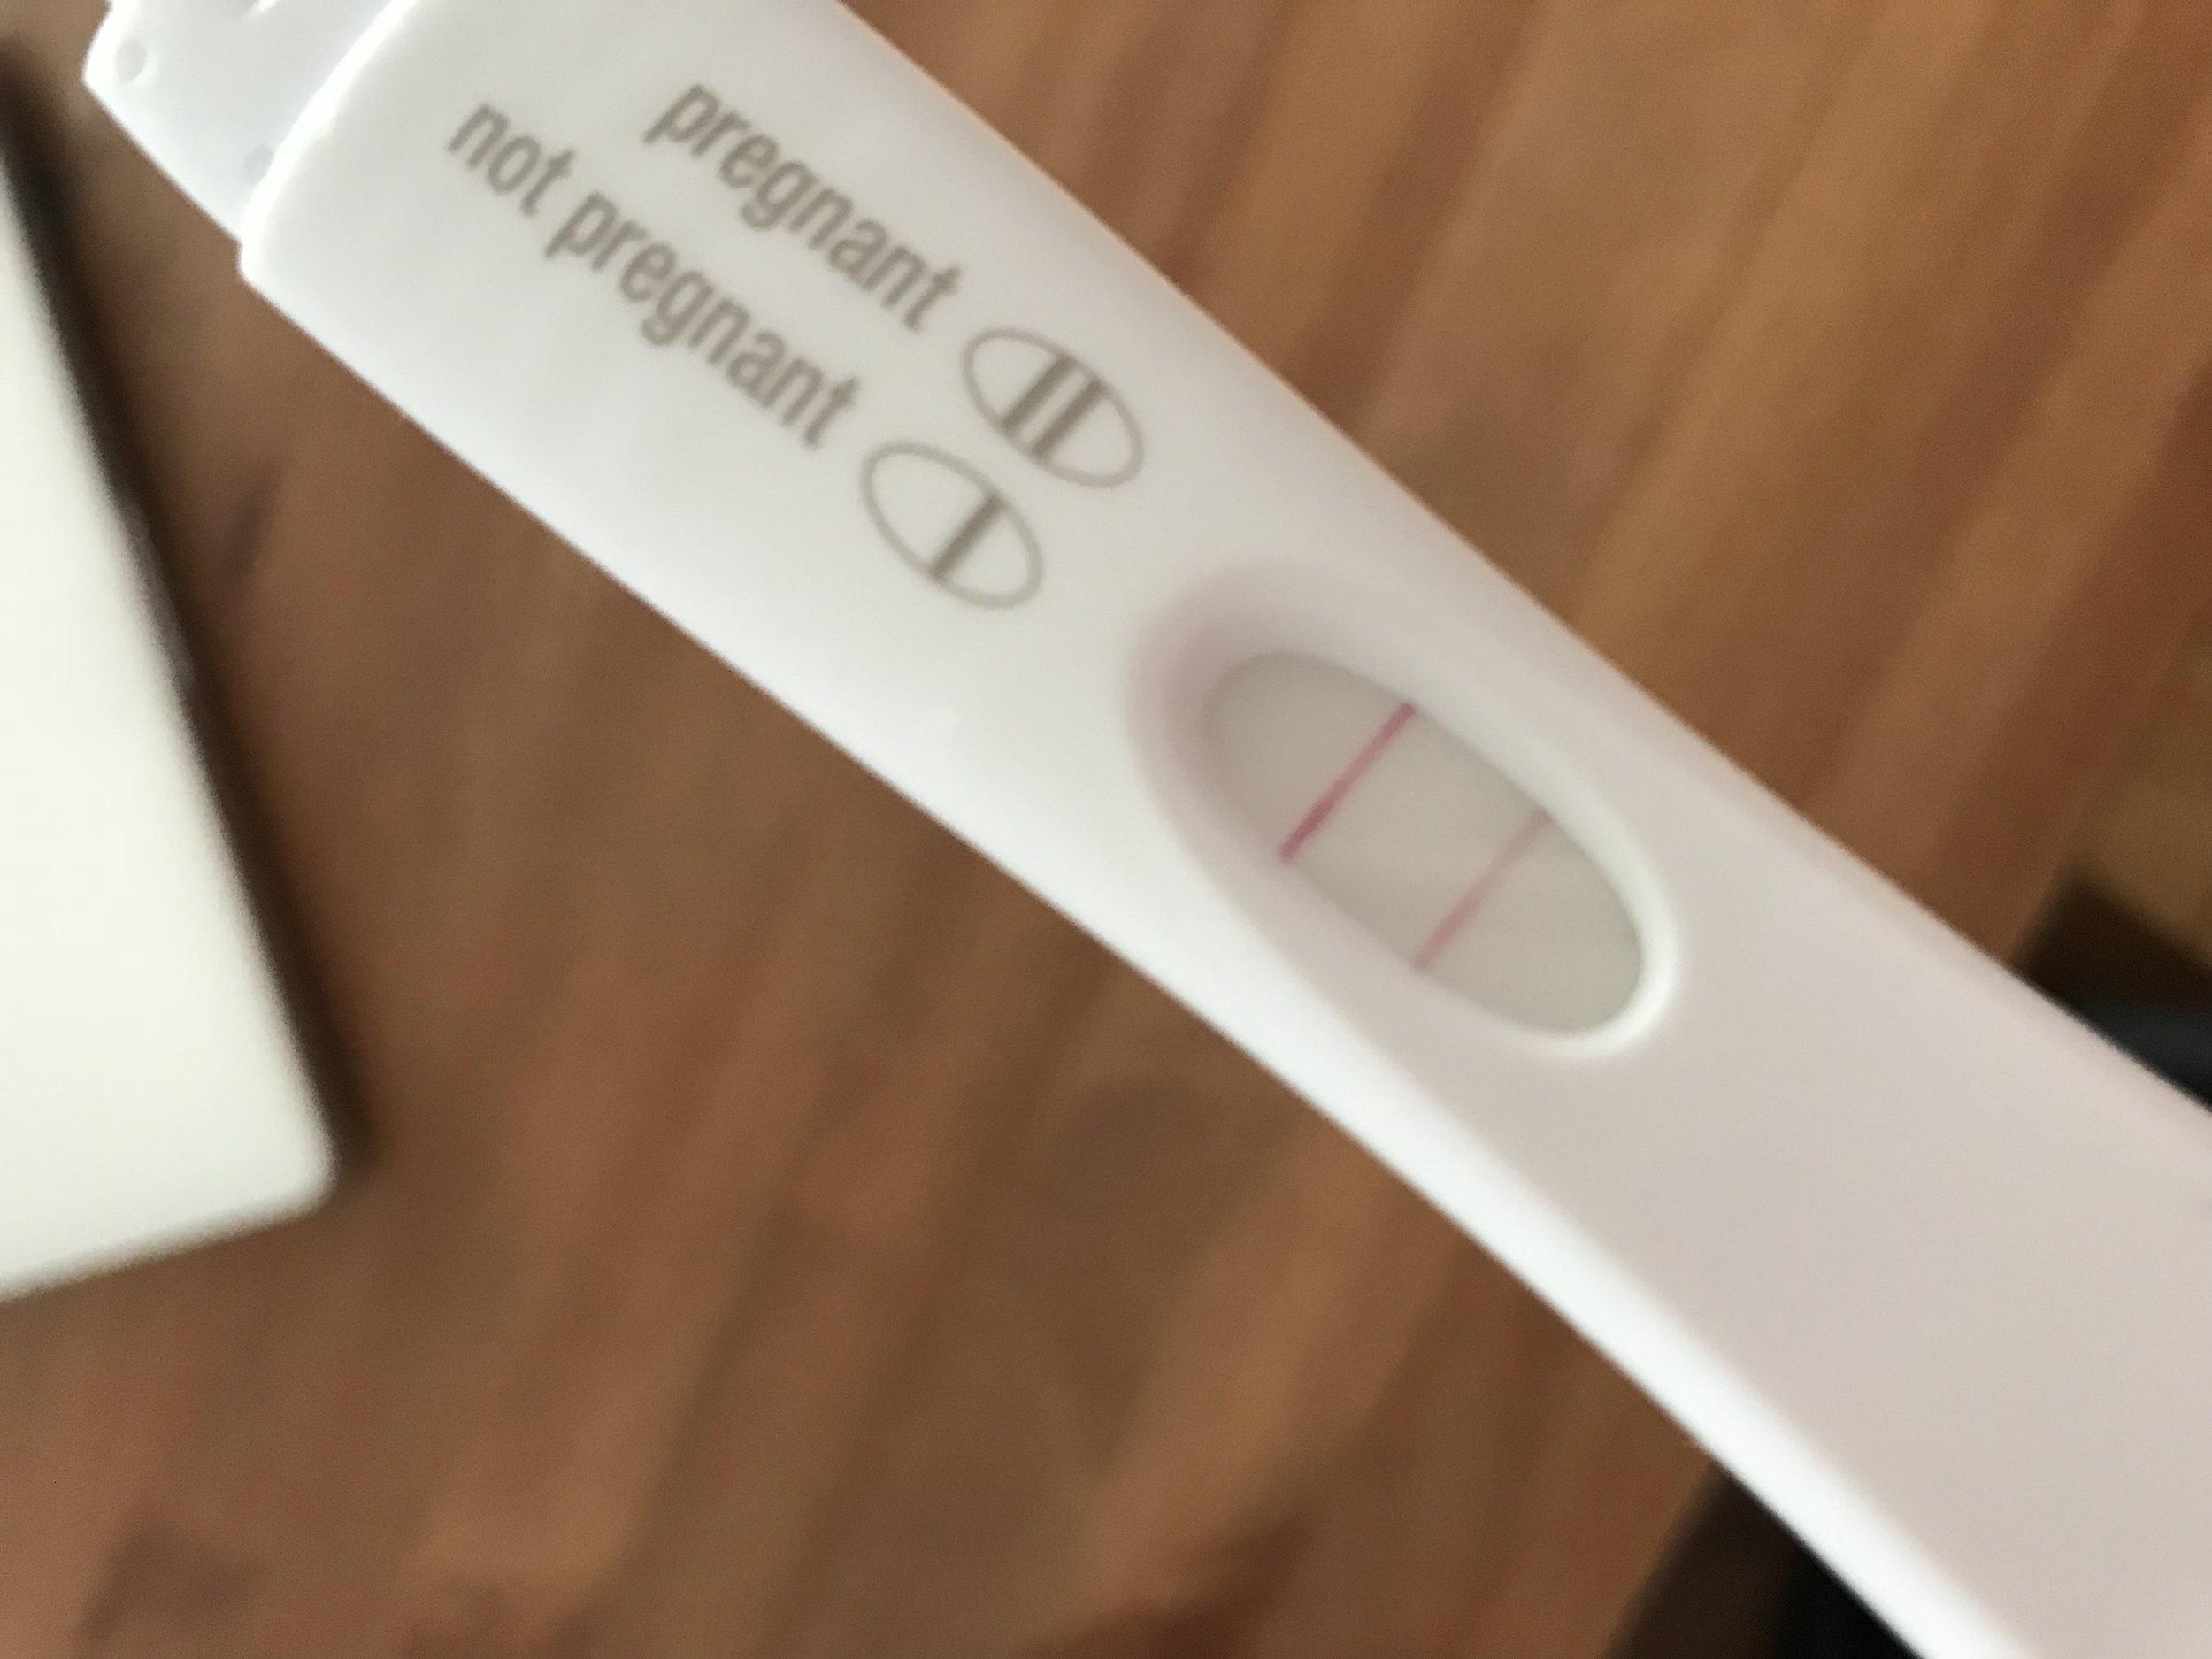 pregnancy_test1.jpg